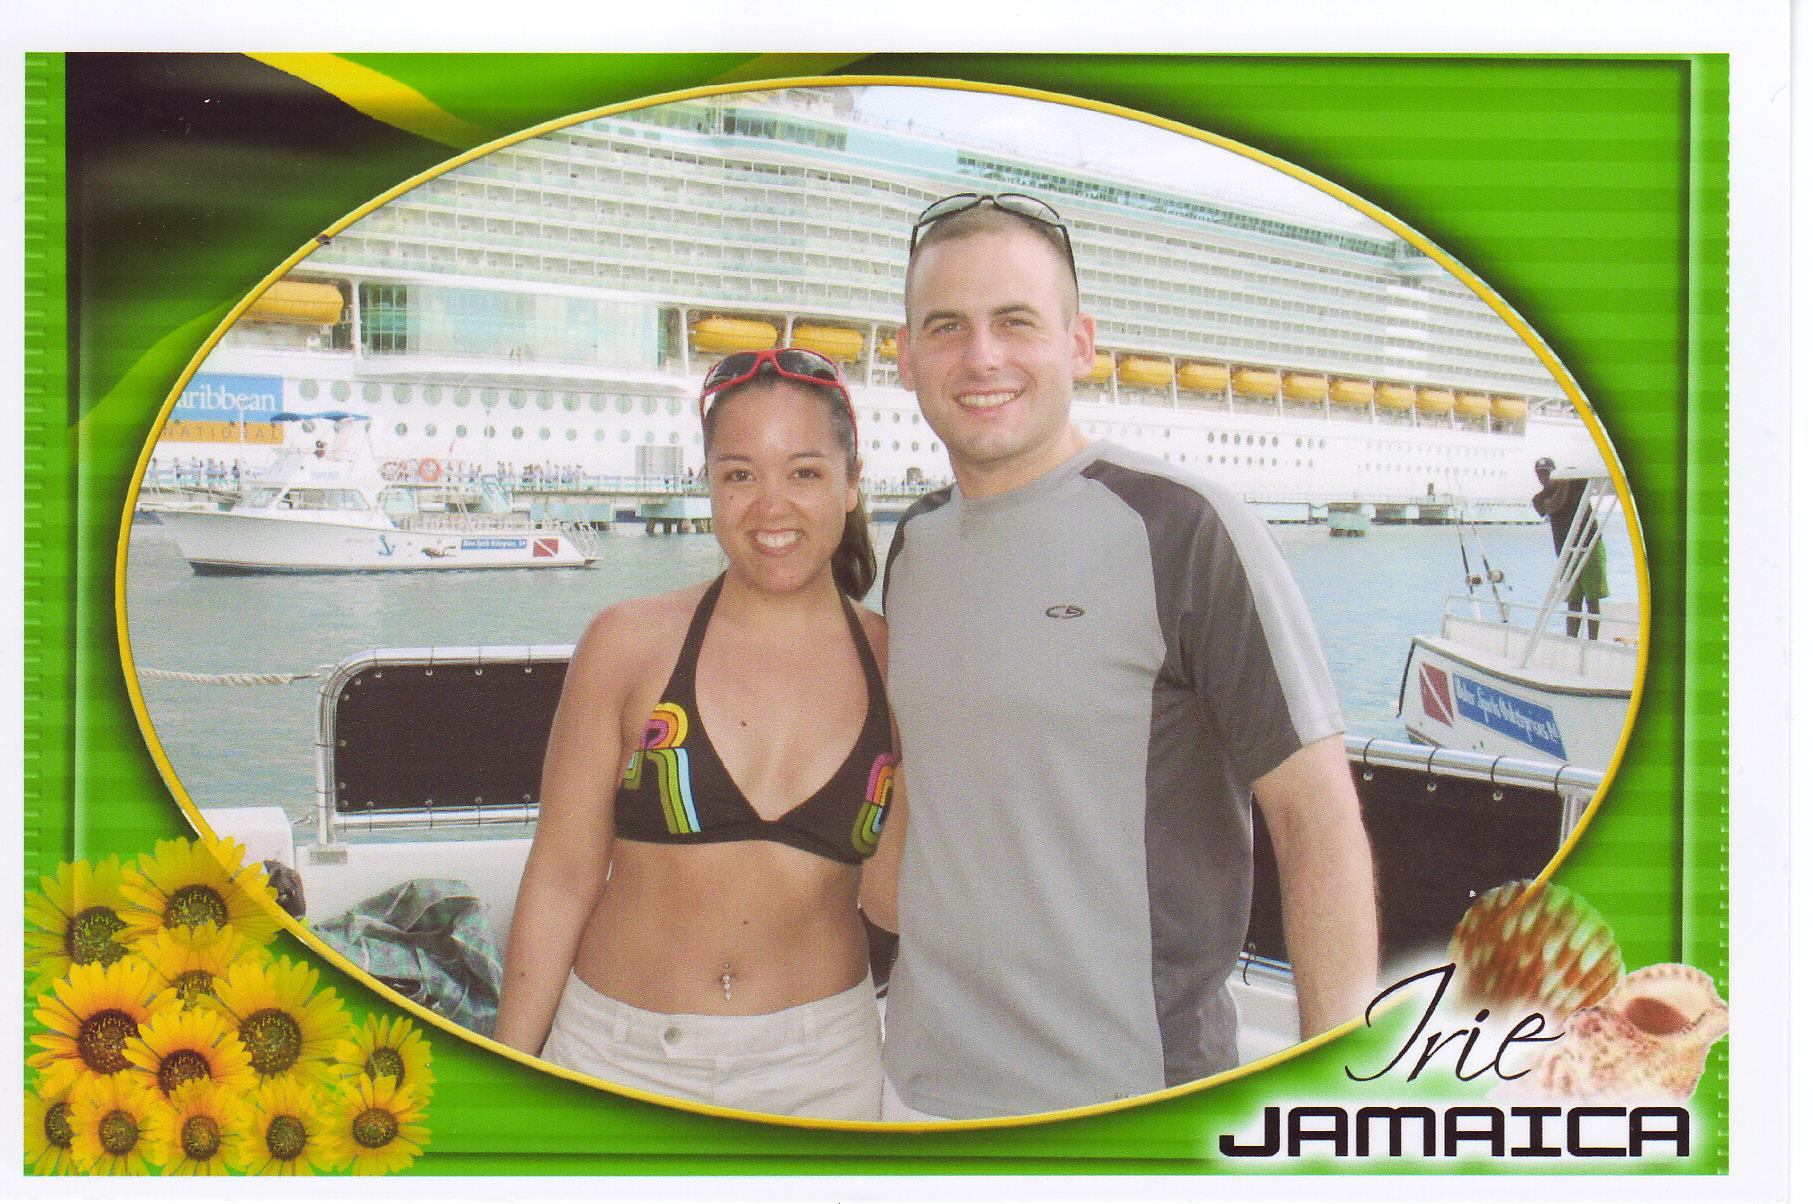 bob merry from jamaica.